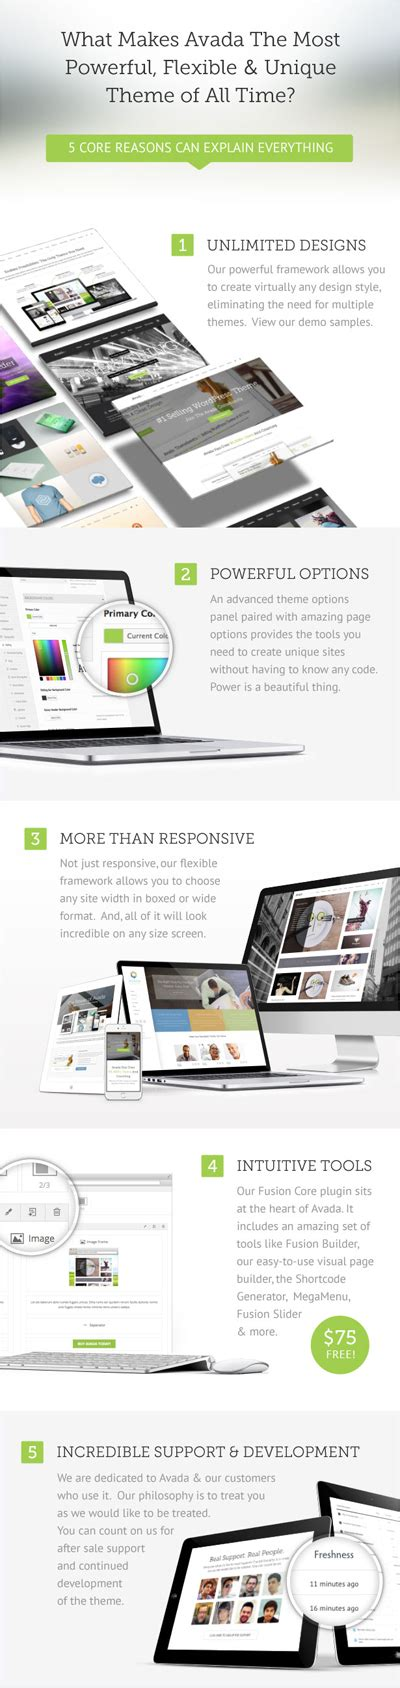 avada theme related posts avada theme 1 워드프레스 디자인테마 website development tutorial